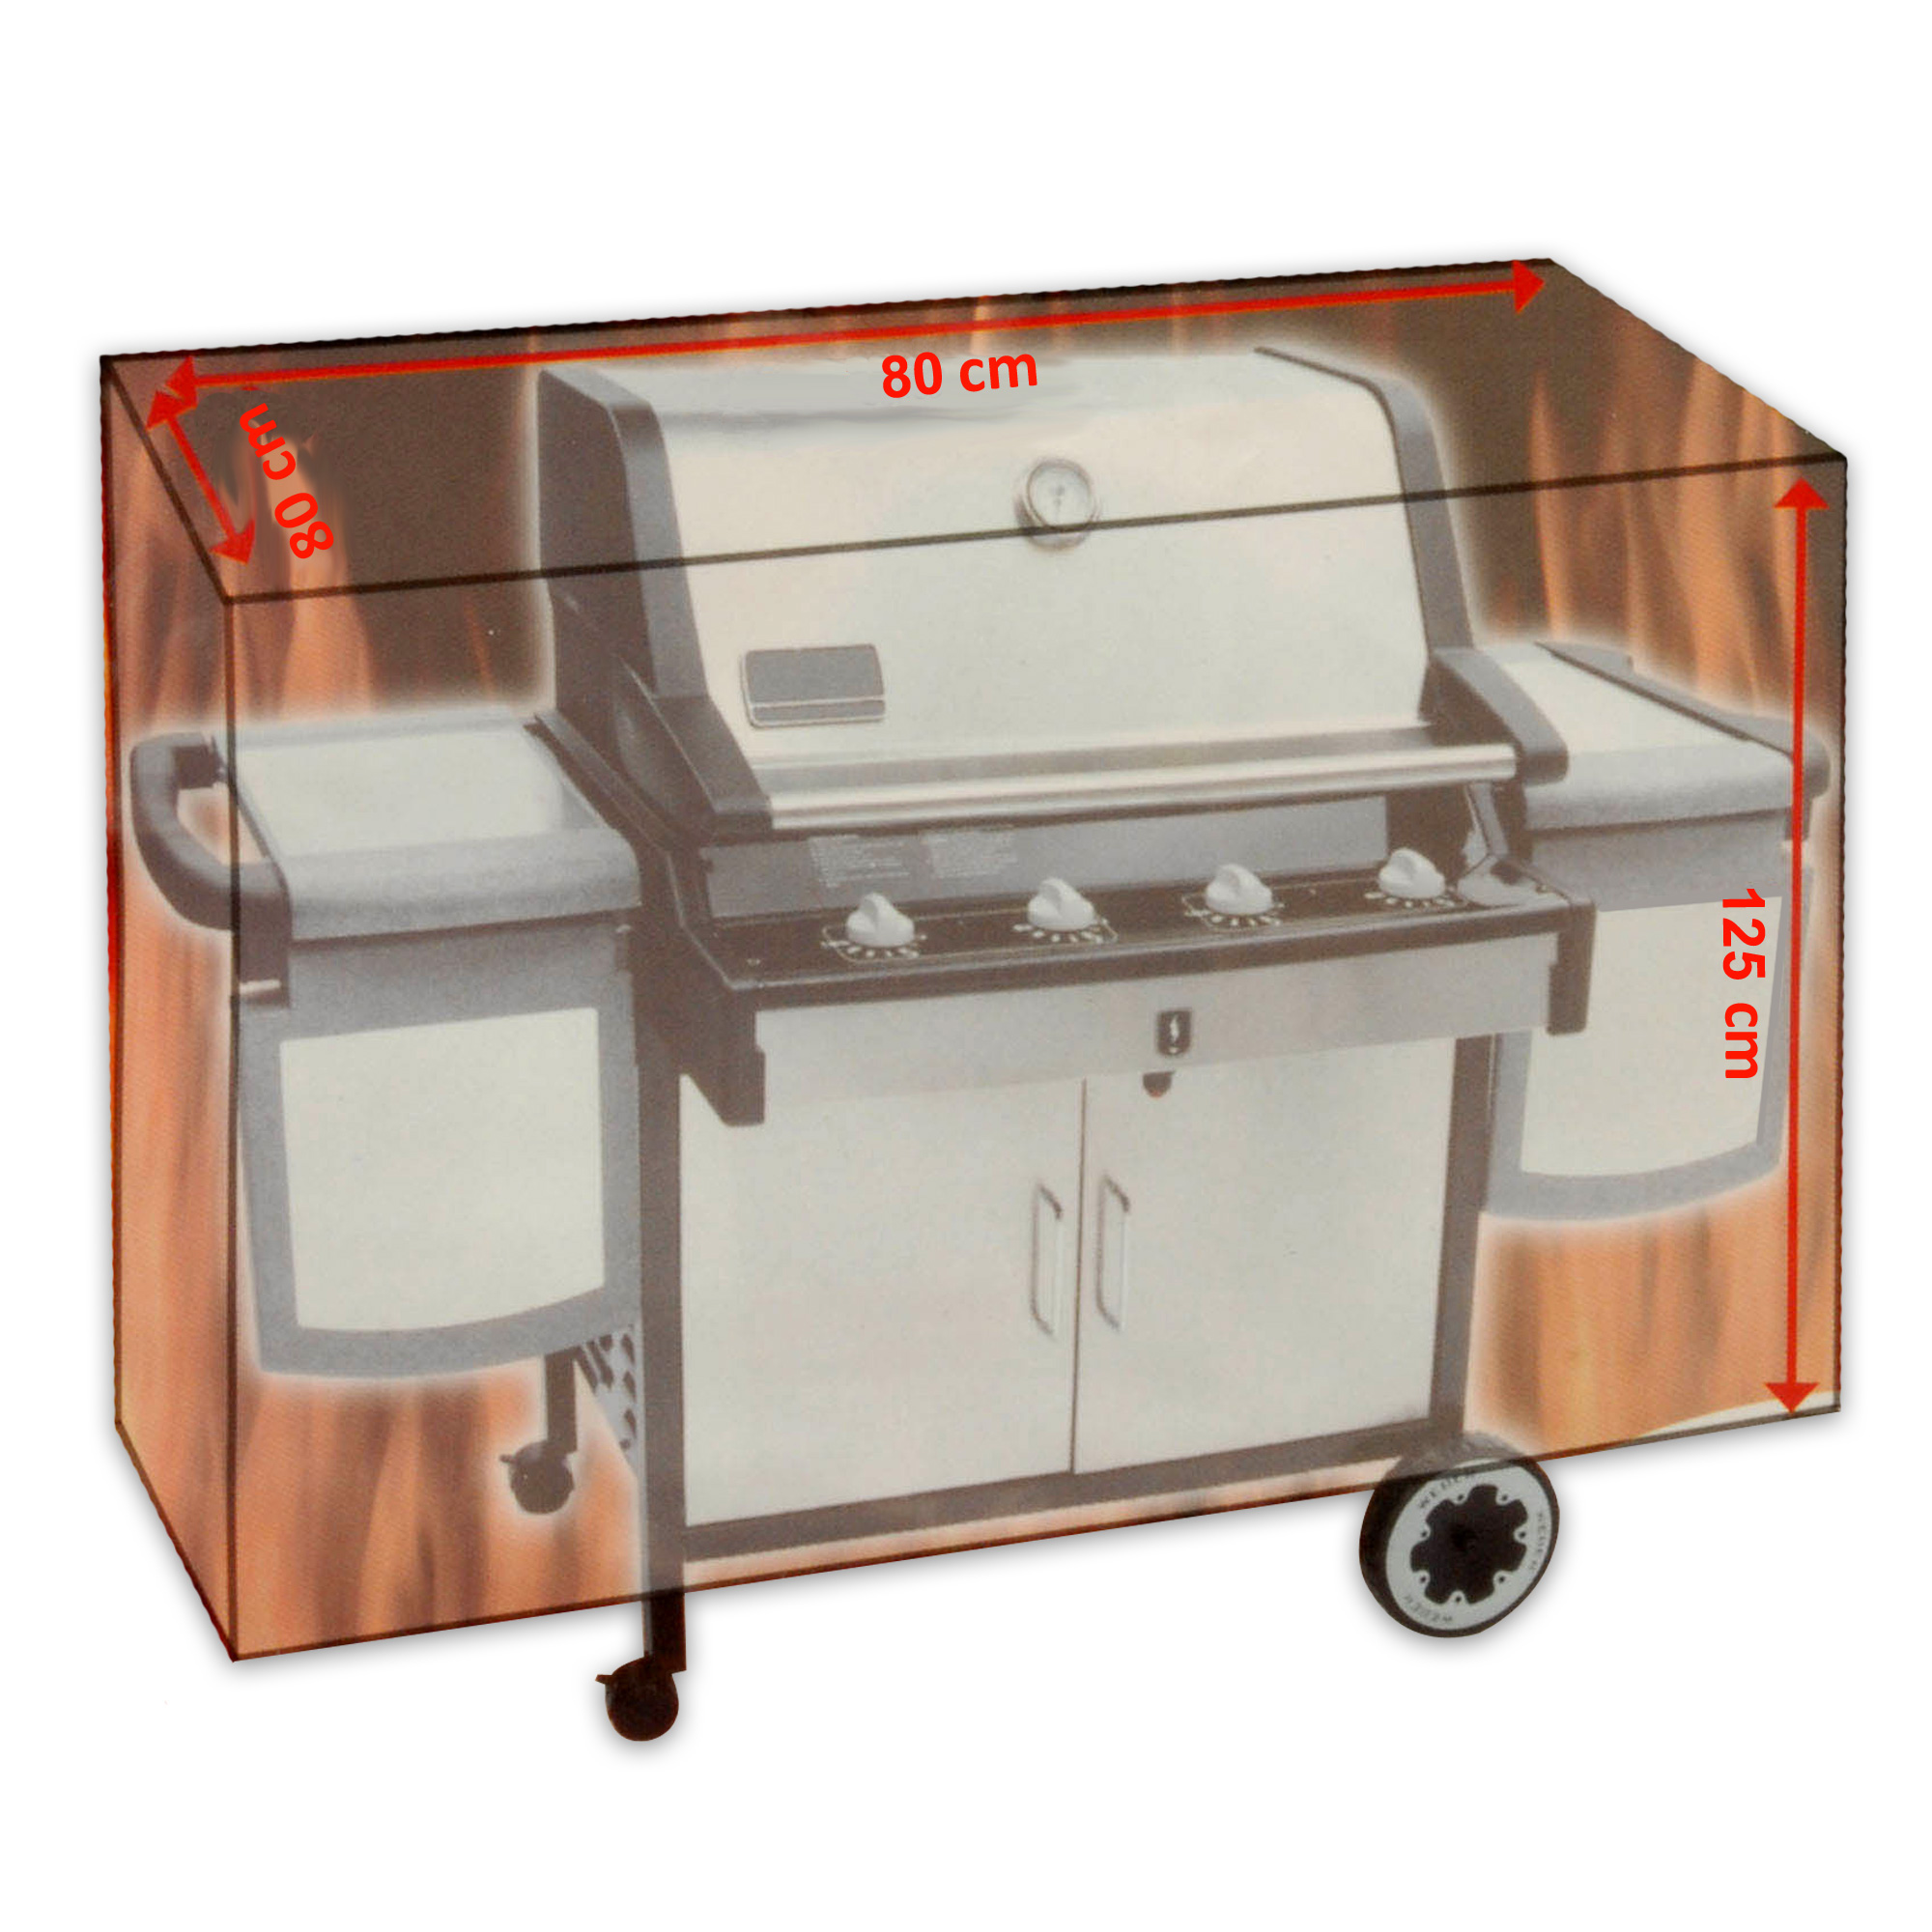 Housse pour barbecue 80 x 125 80 cm grill couverture de protection ebay - Grille barbecue 80 cm ...